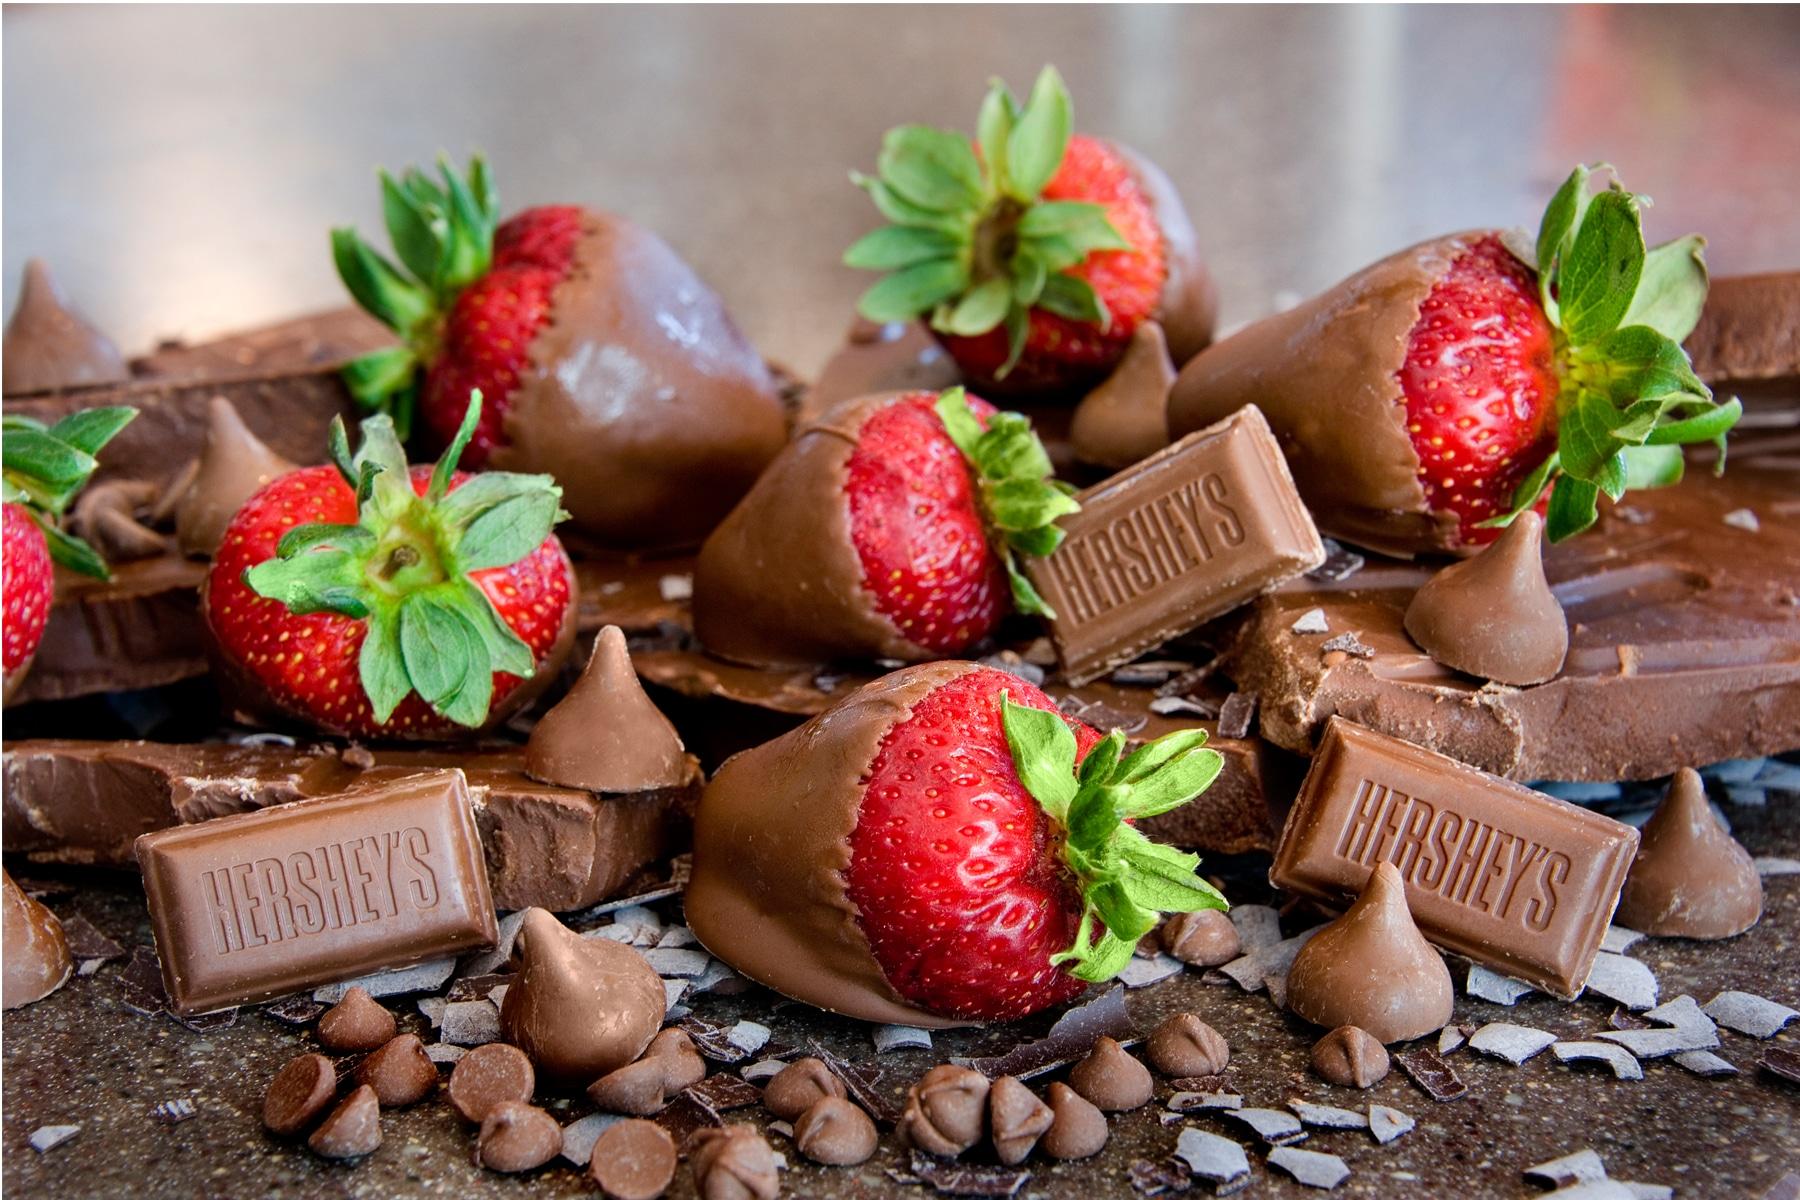 Blog - Hershey's Chocolate World Las Vegas